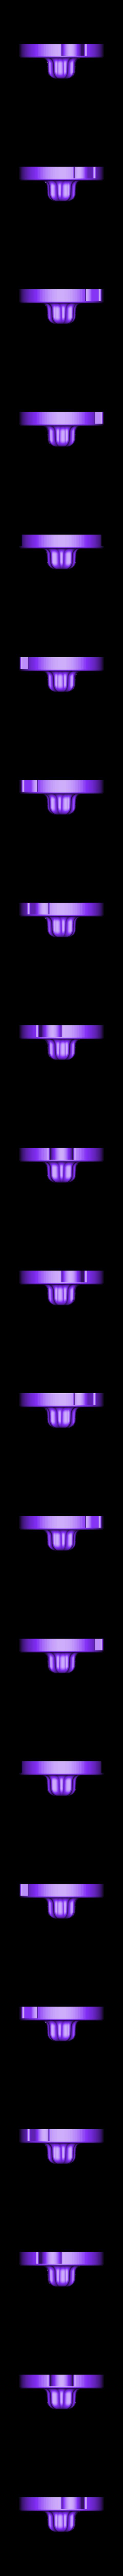 roue_2.stl Download free STL file Pocket Downfall - 10 de chute de poche • Design to 3D print, lipki